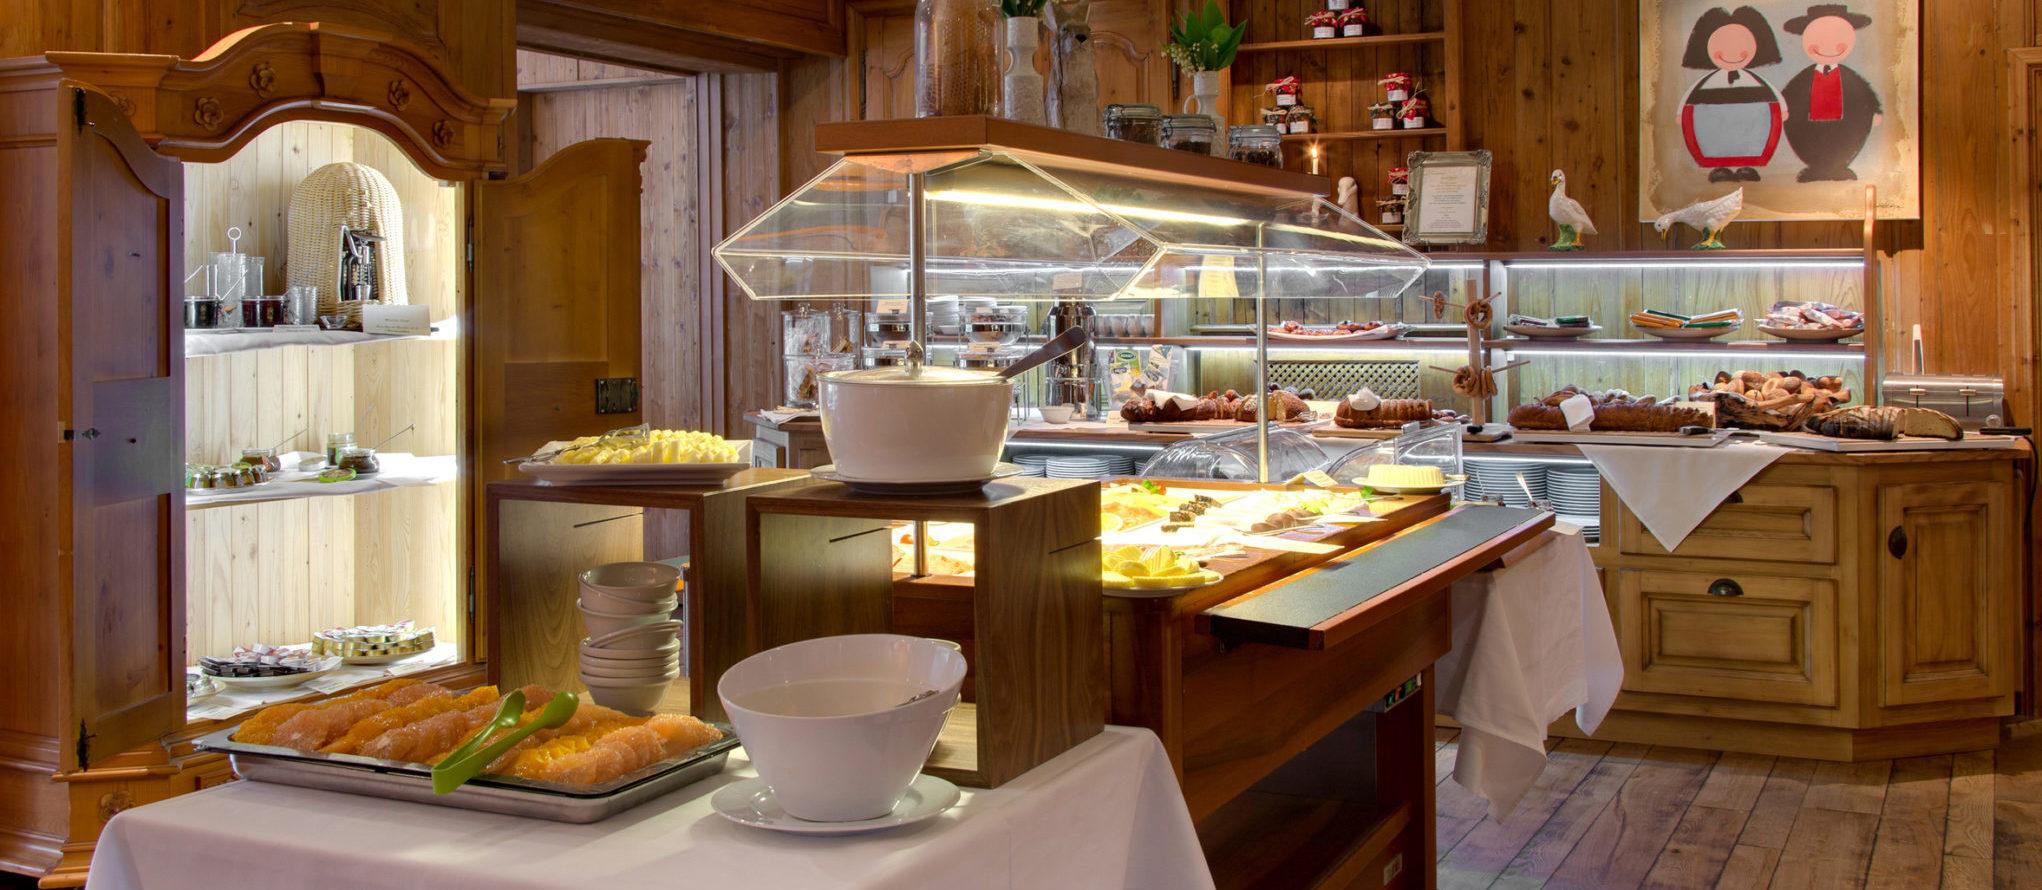 Restaurant Gastronomique Cheneaudiere